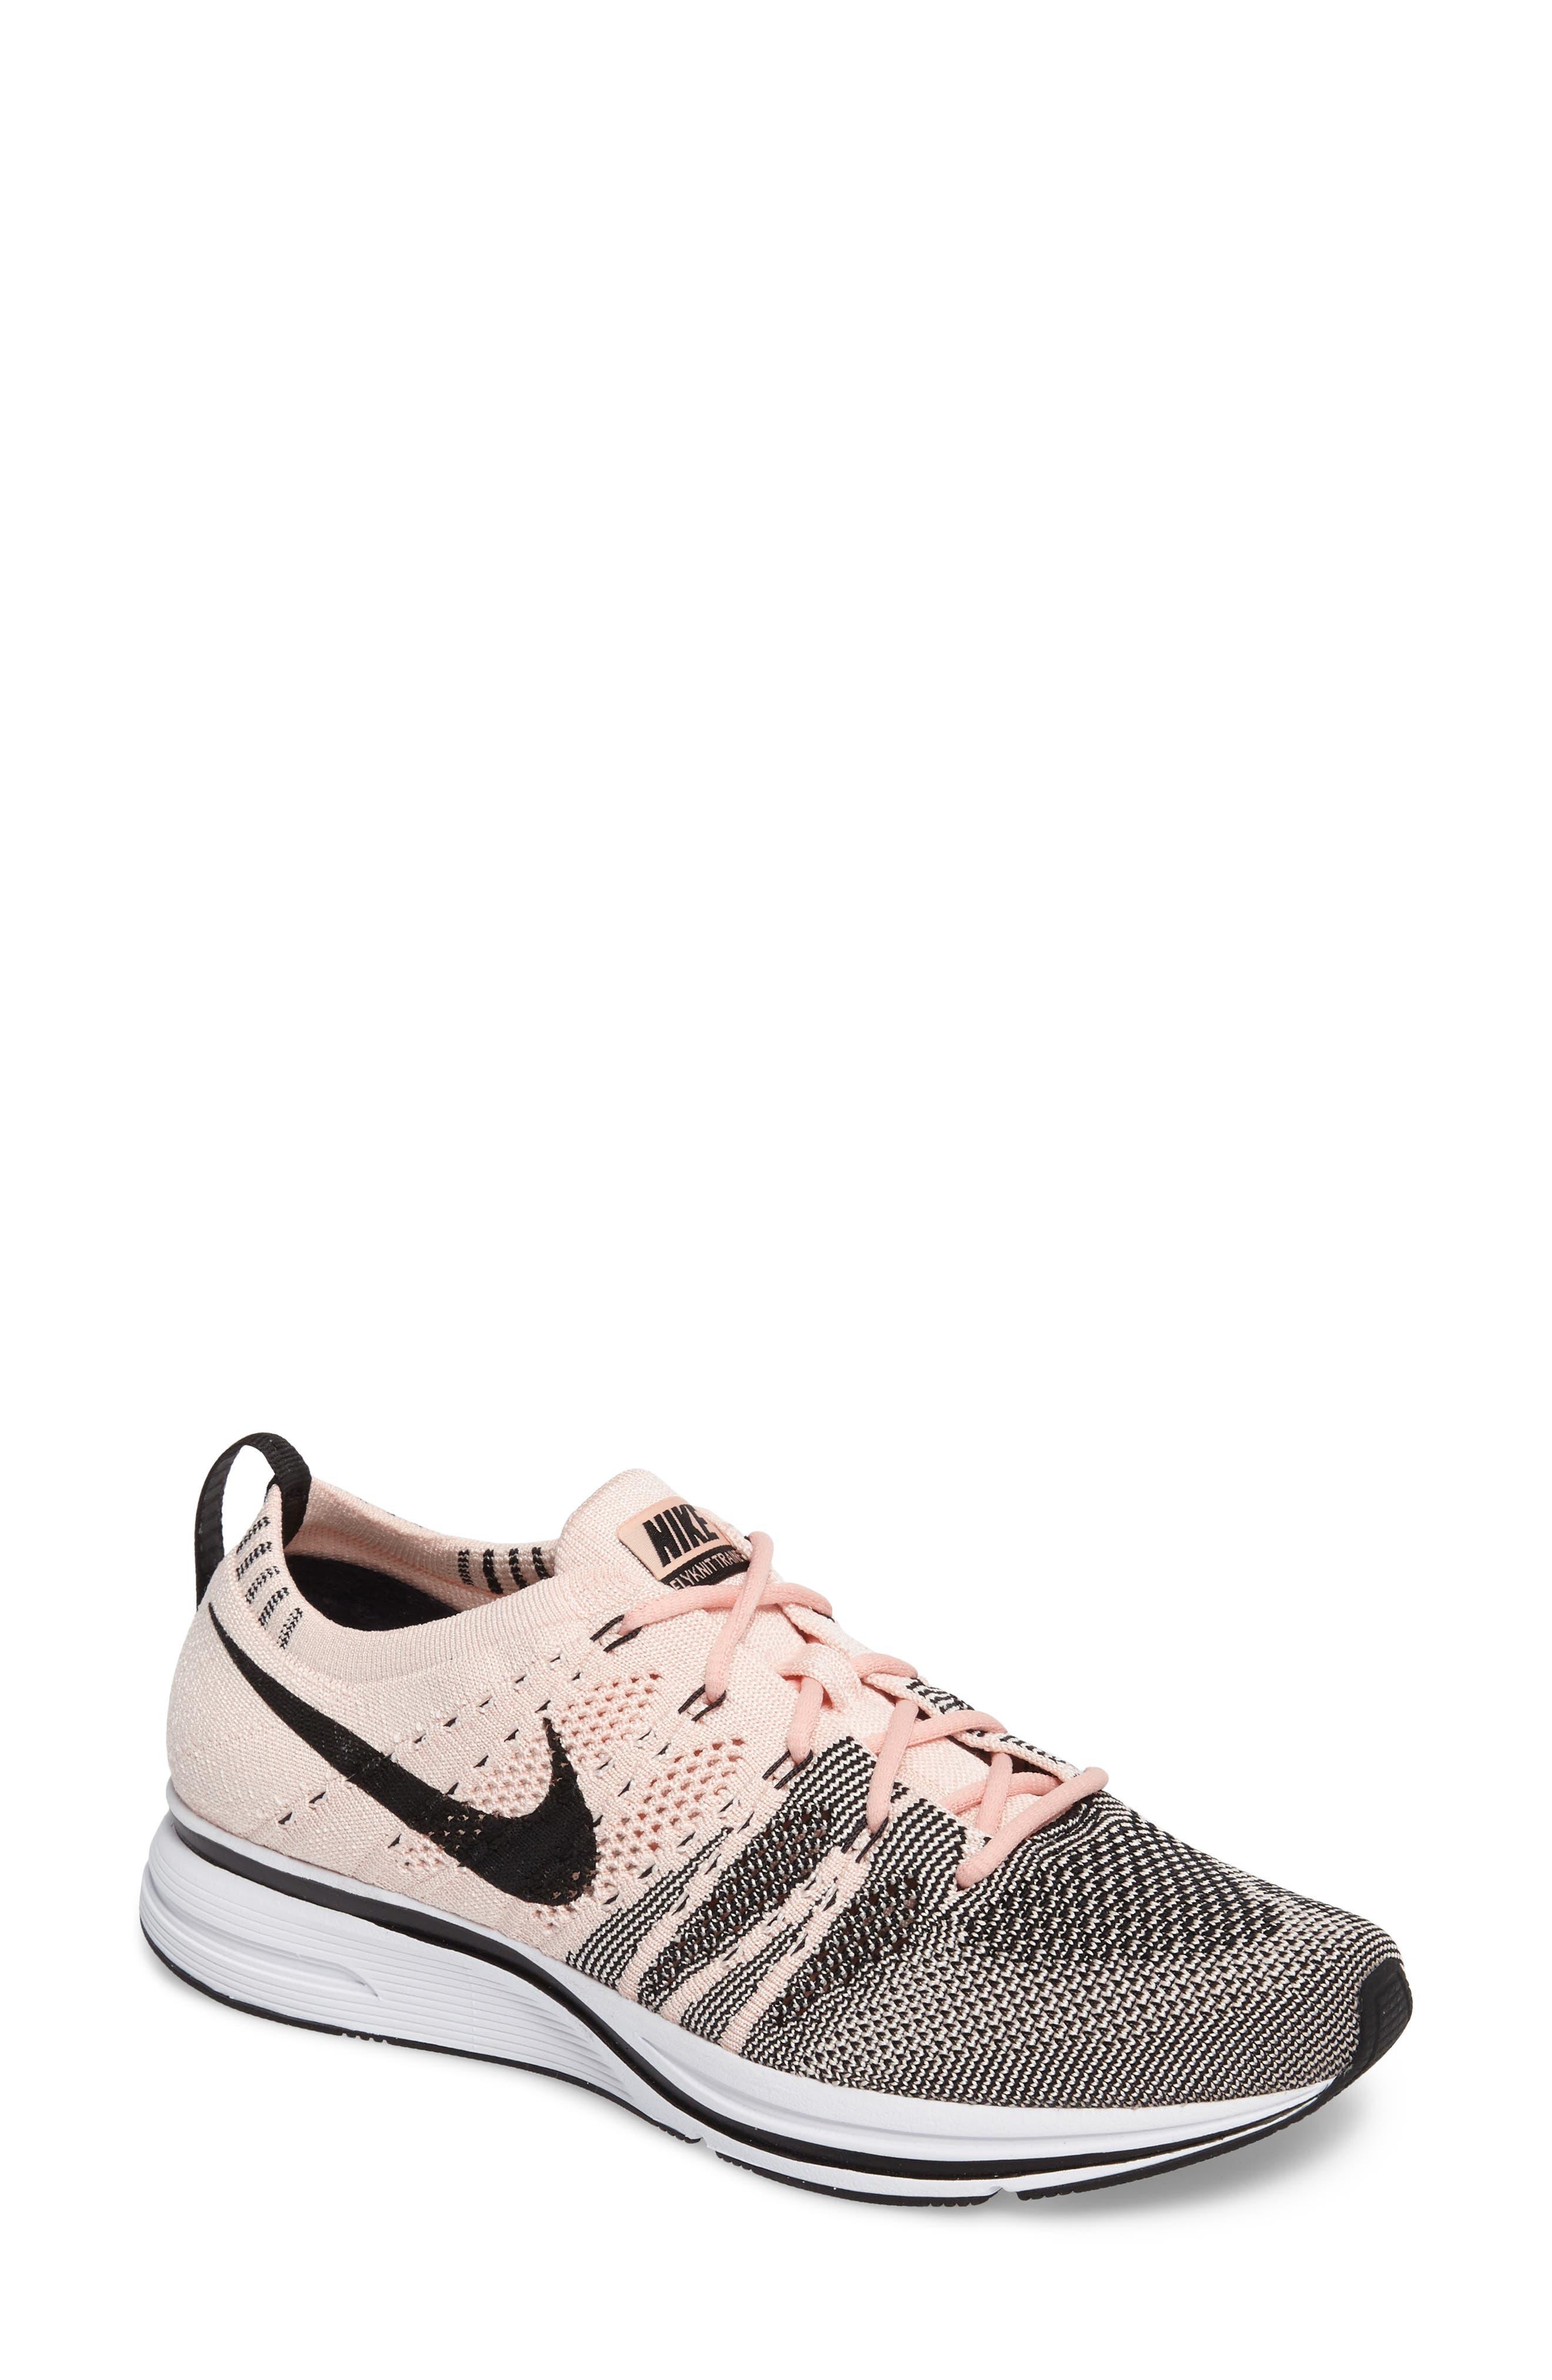 NikeLab Flyknit Trainer Sneaker,                         Main,                         color, Sunset Tint/Black-White